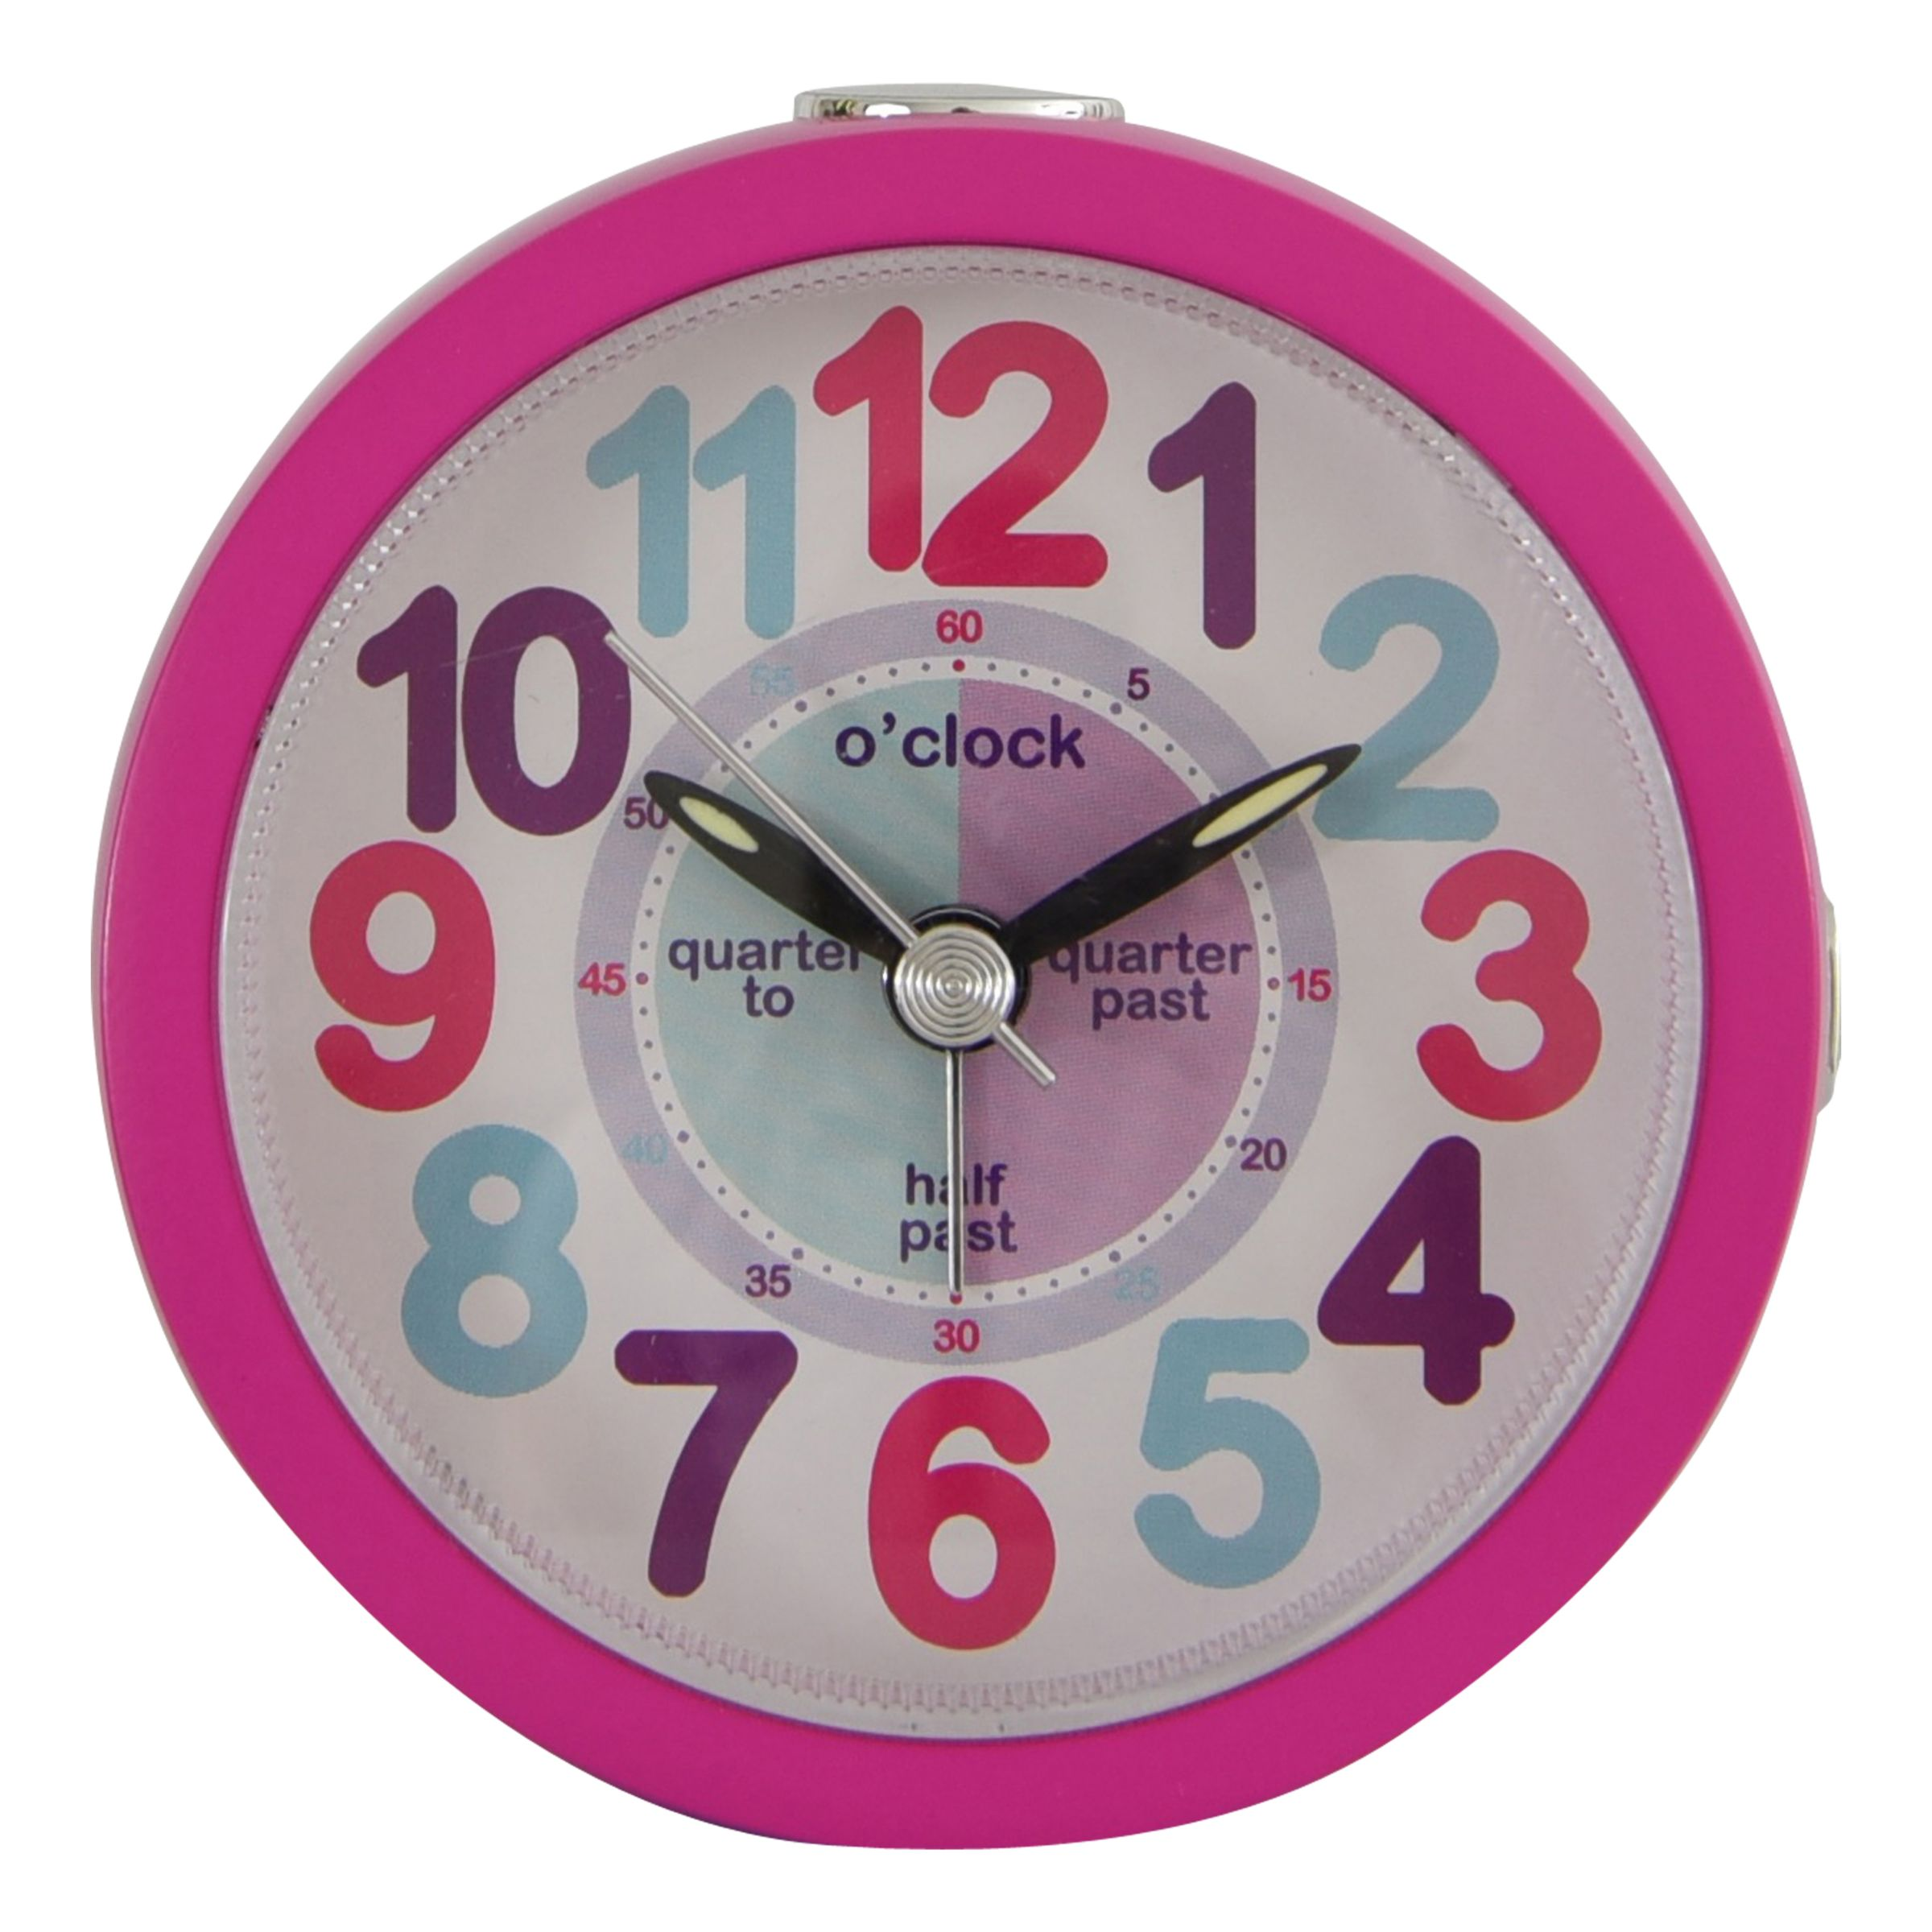 London Clock Company London Clock Company Tell the Time Alarm Clock